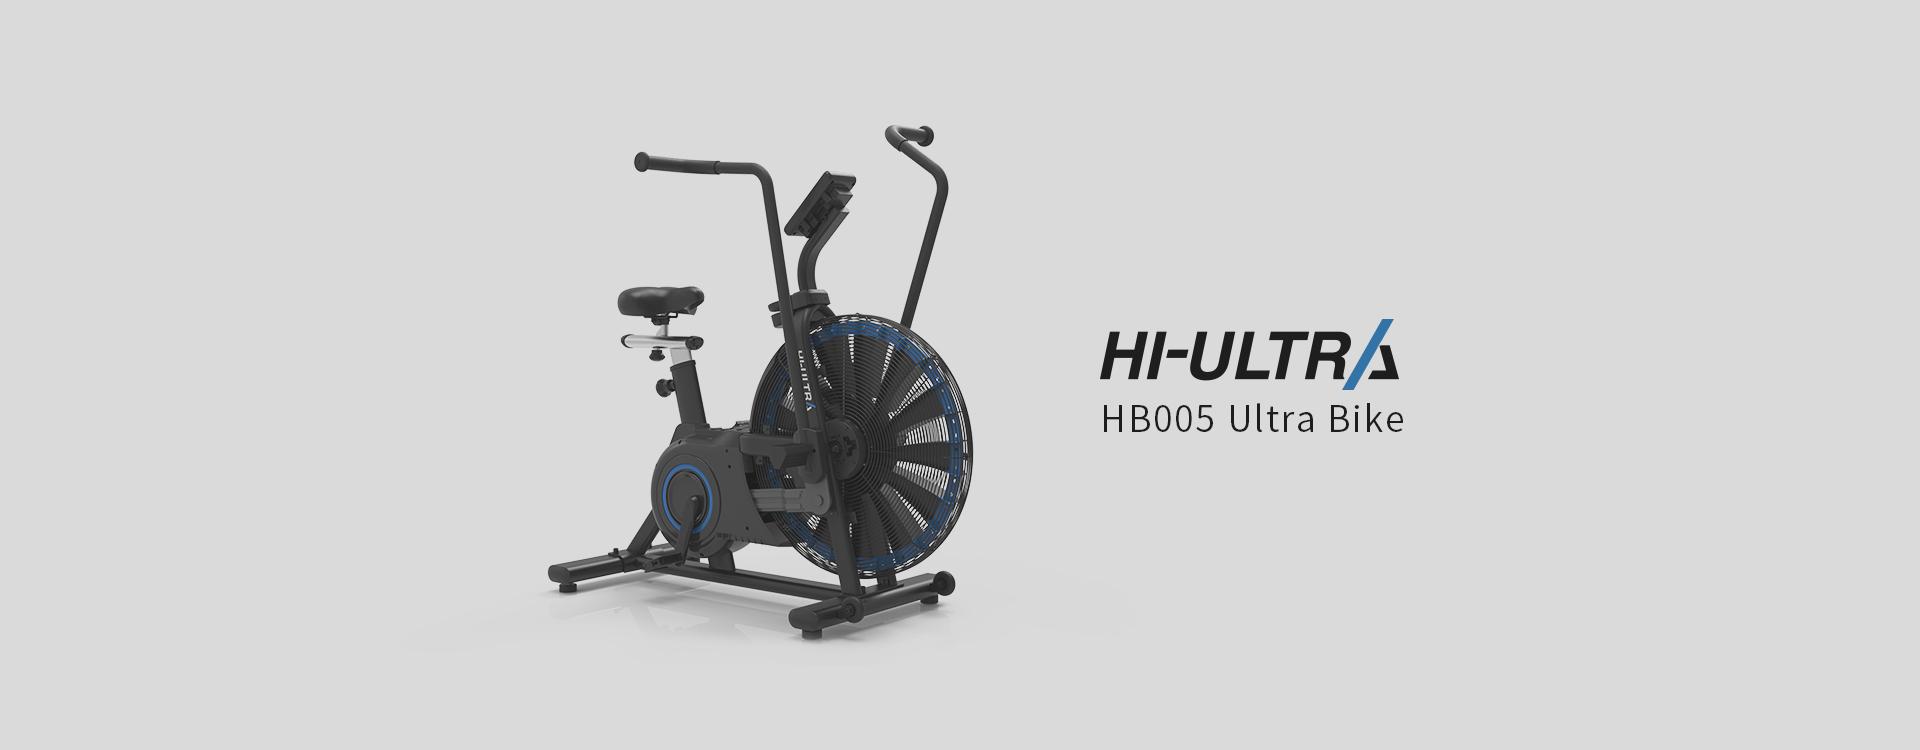 Impulse Fitness HB005 Air Bike HI-ULTRA Banner